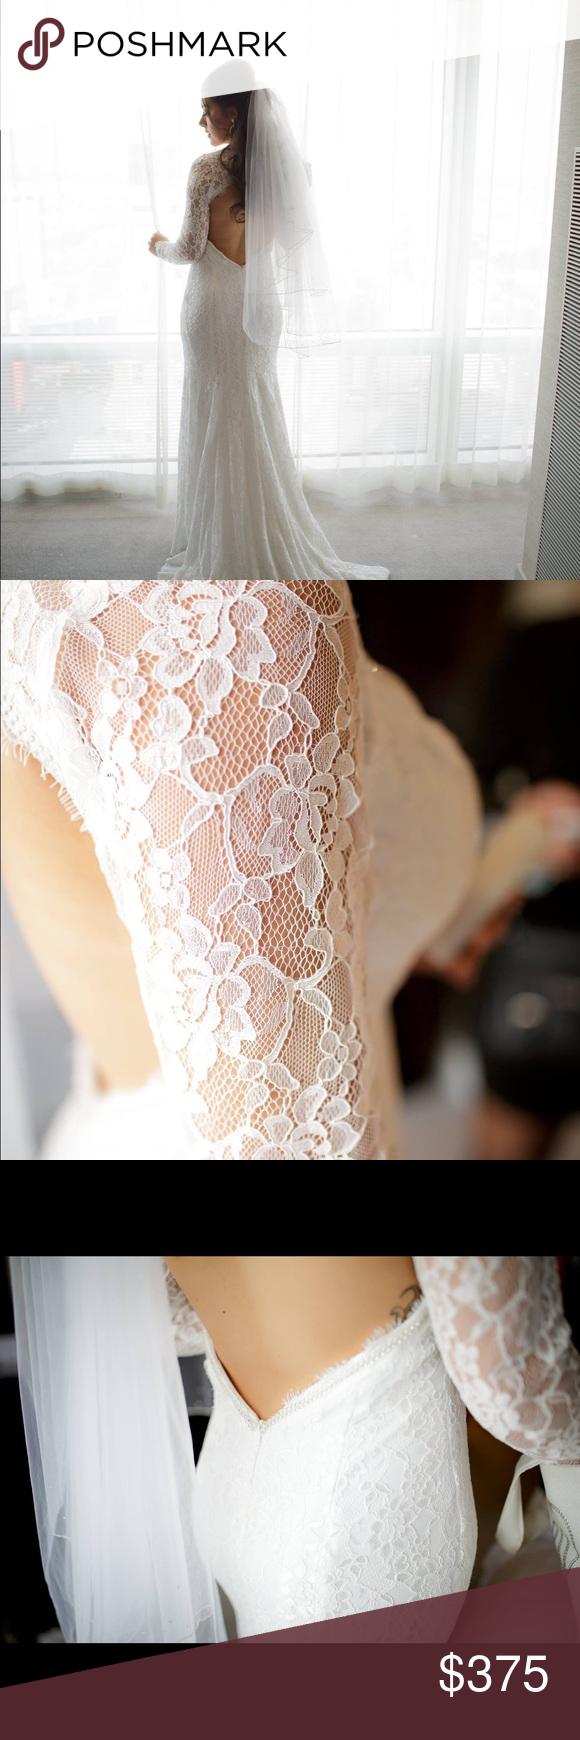 Gorgeous lace wedding dress lace wedding dresses lace wedding and